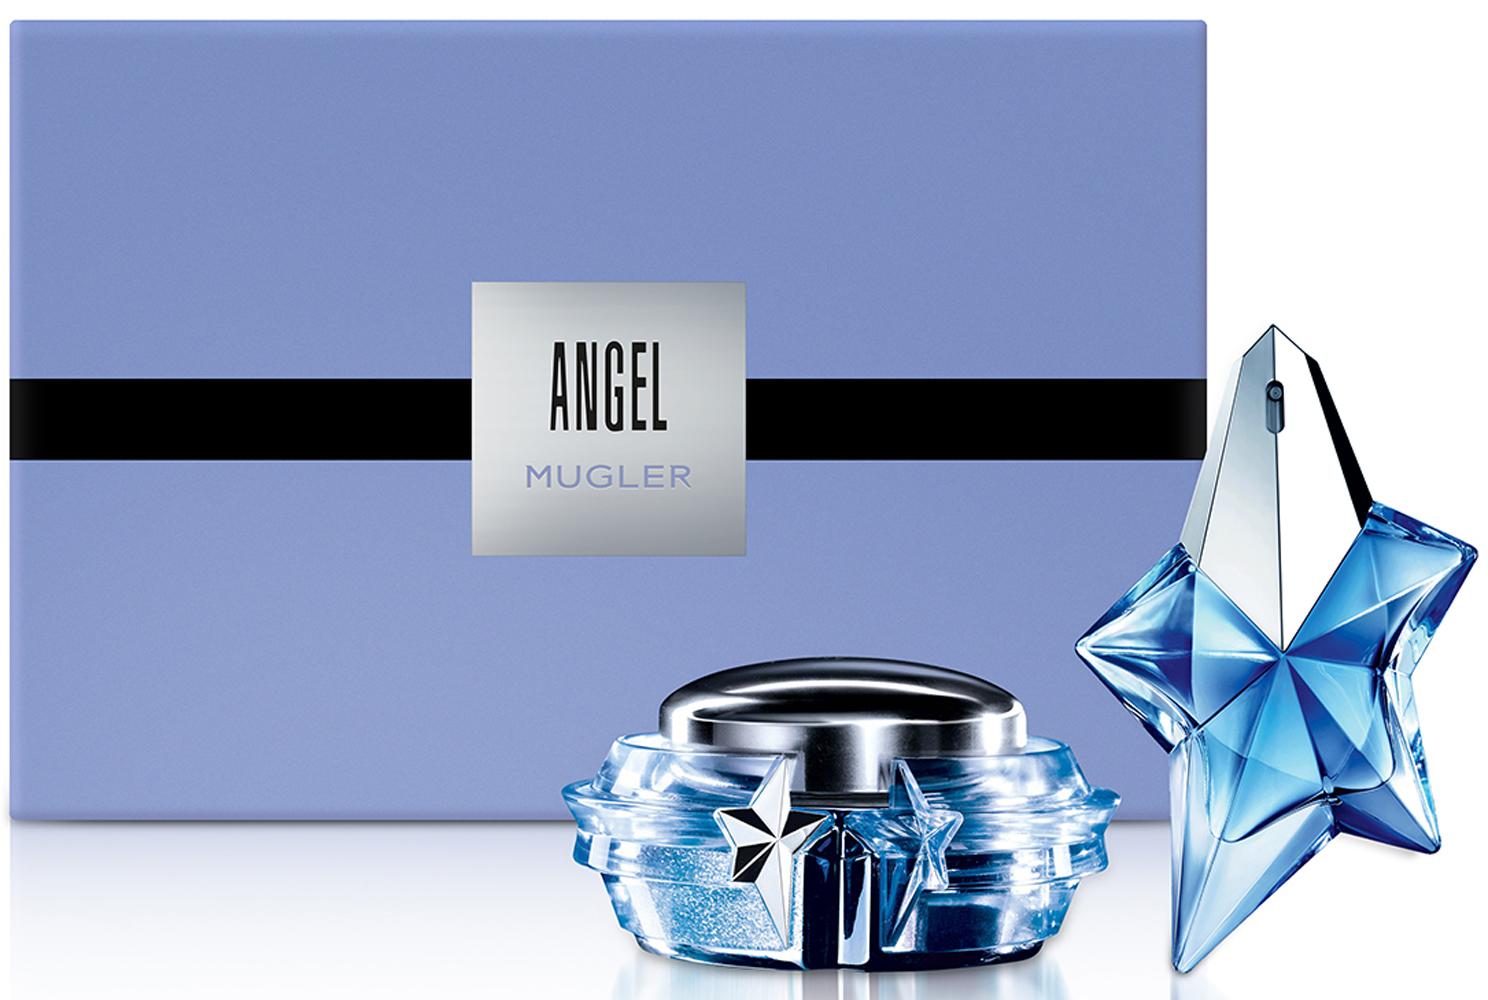 Mugler Набор Angel: Парфюмерная вода 50 мл, Крем для тела, 200 мл mugler набор angel парфюмерная вода 50 мл крем для тела 200 мл